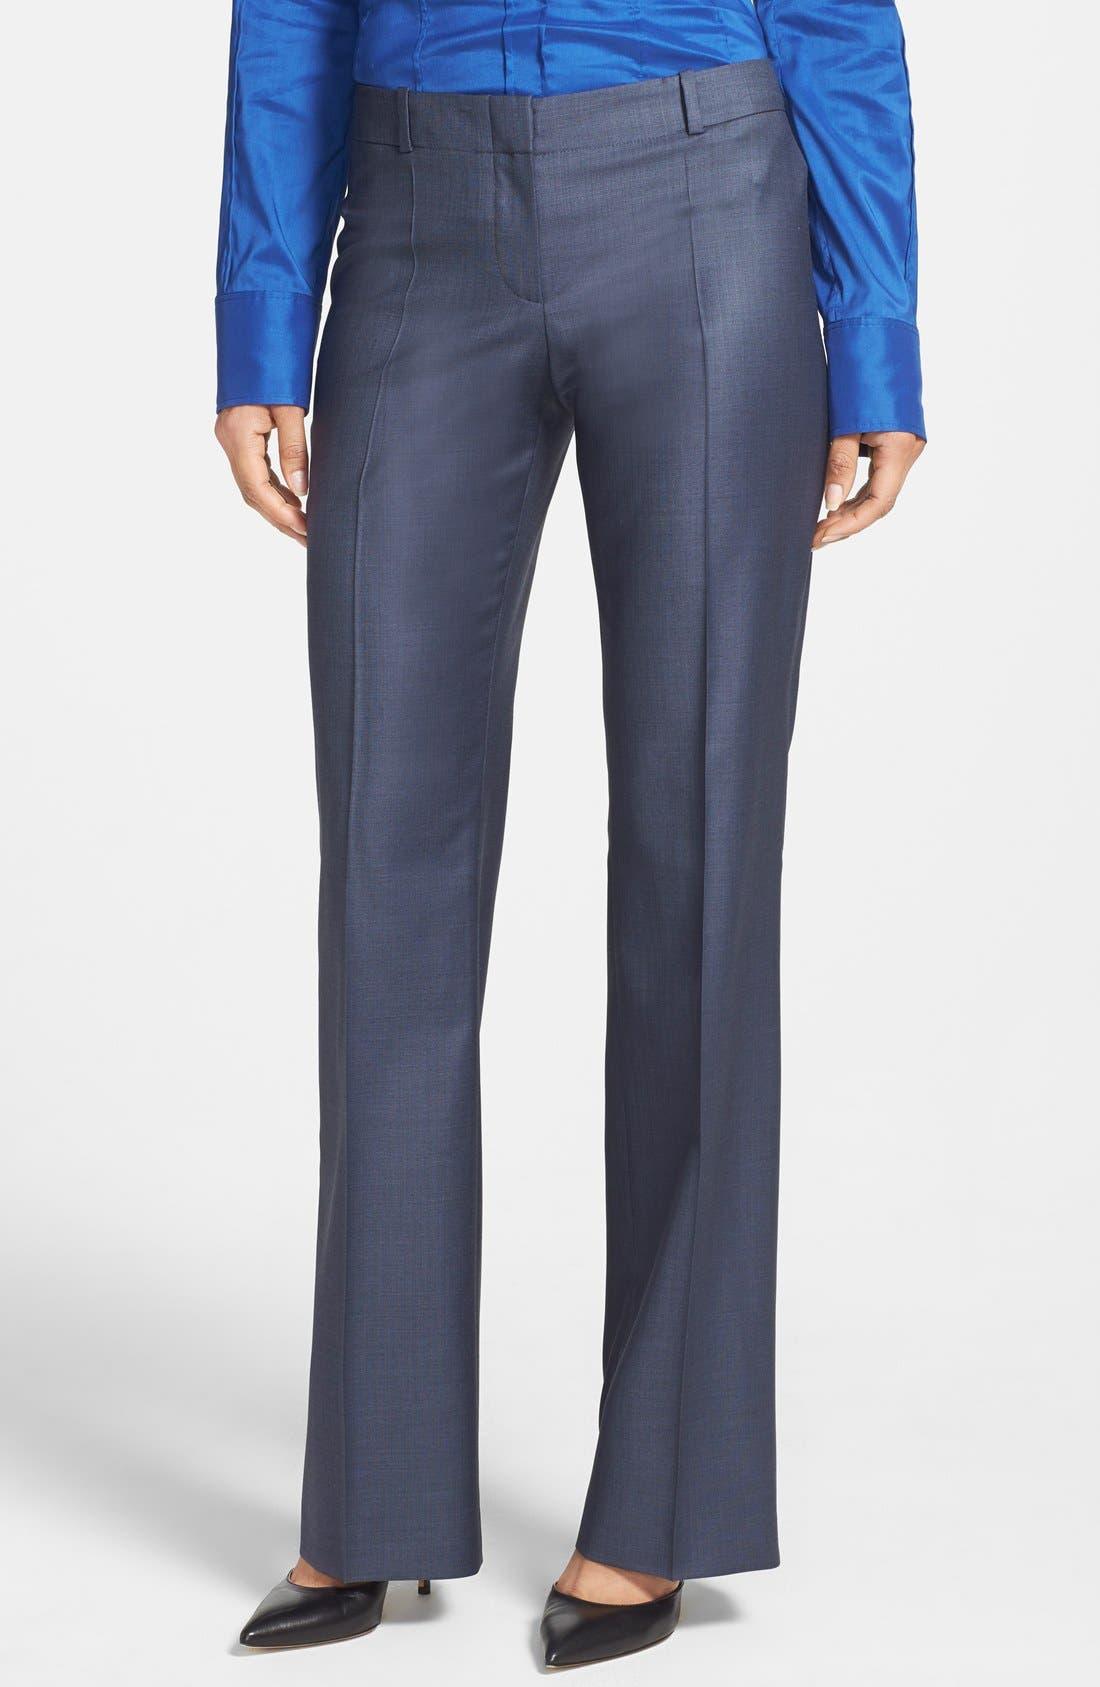 'Temuna' Wool Blend Suiting Trousers,                             Main thumbnail 1, color,                             463